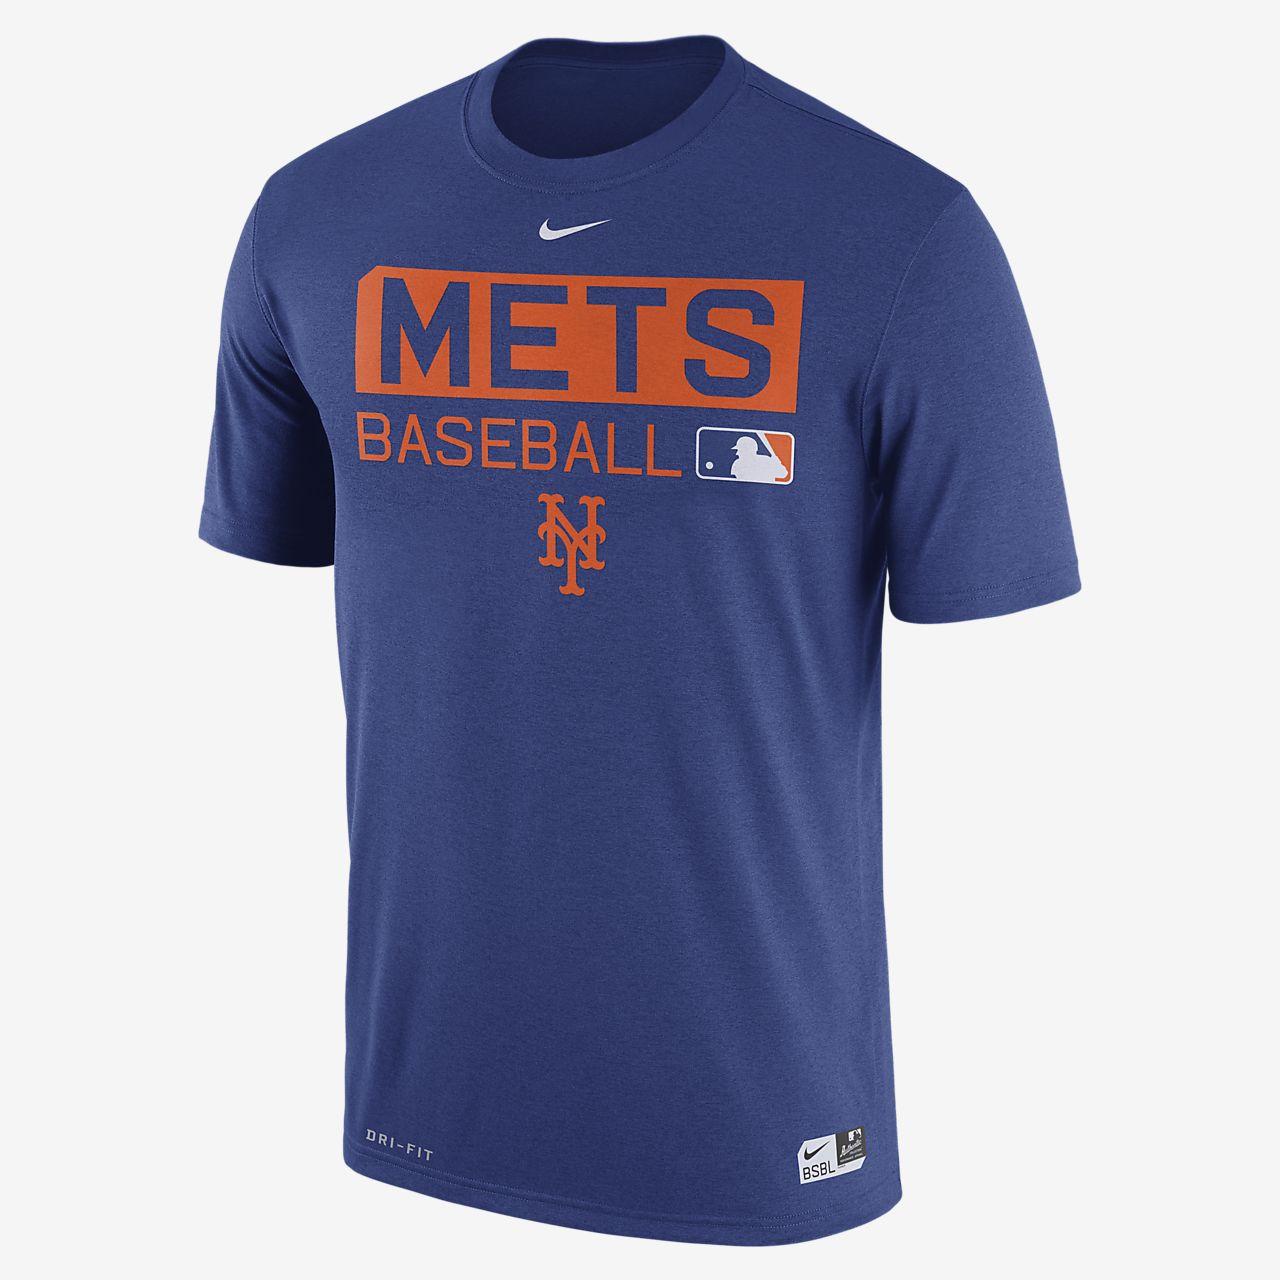 Nike Legend Team Issue (MLB Mets) Men's T-Shirts Royal